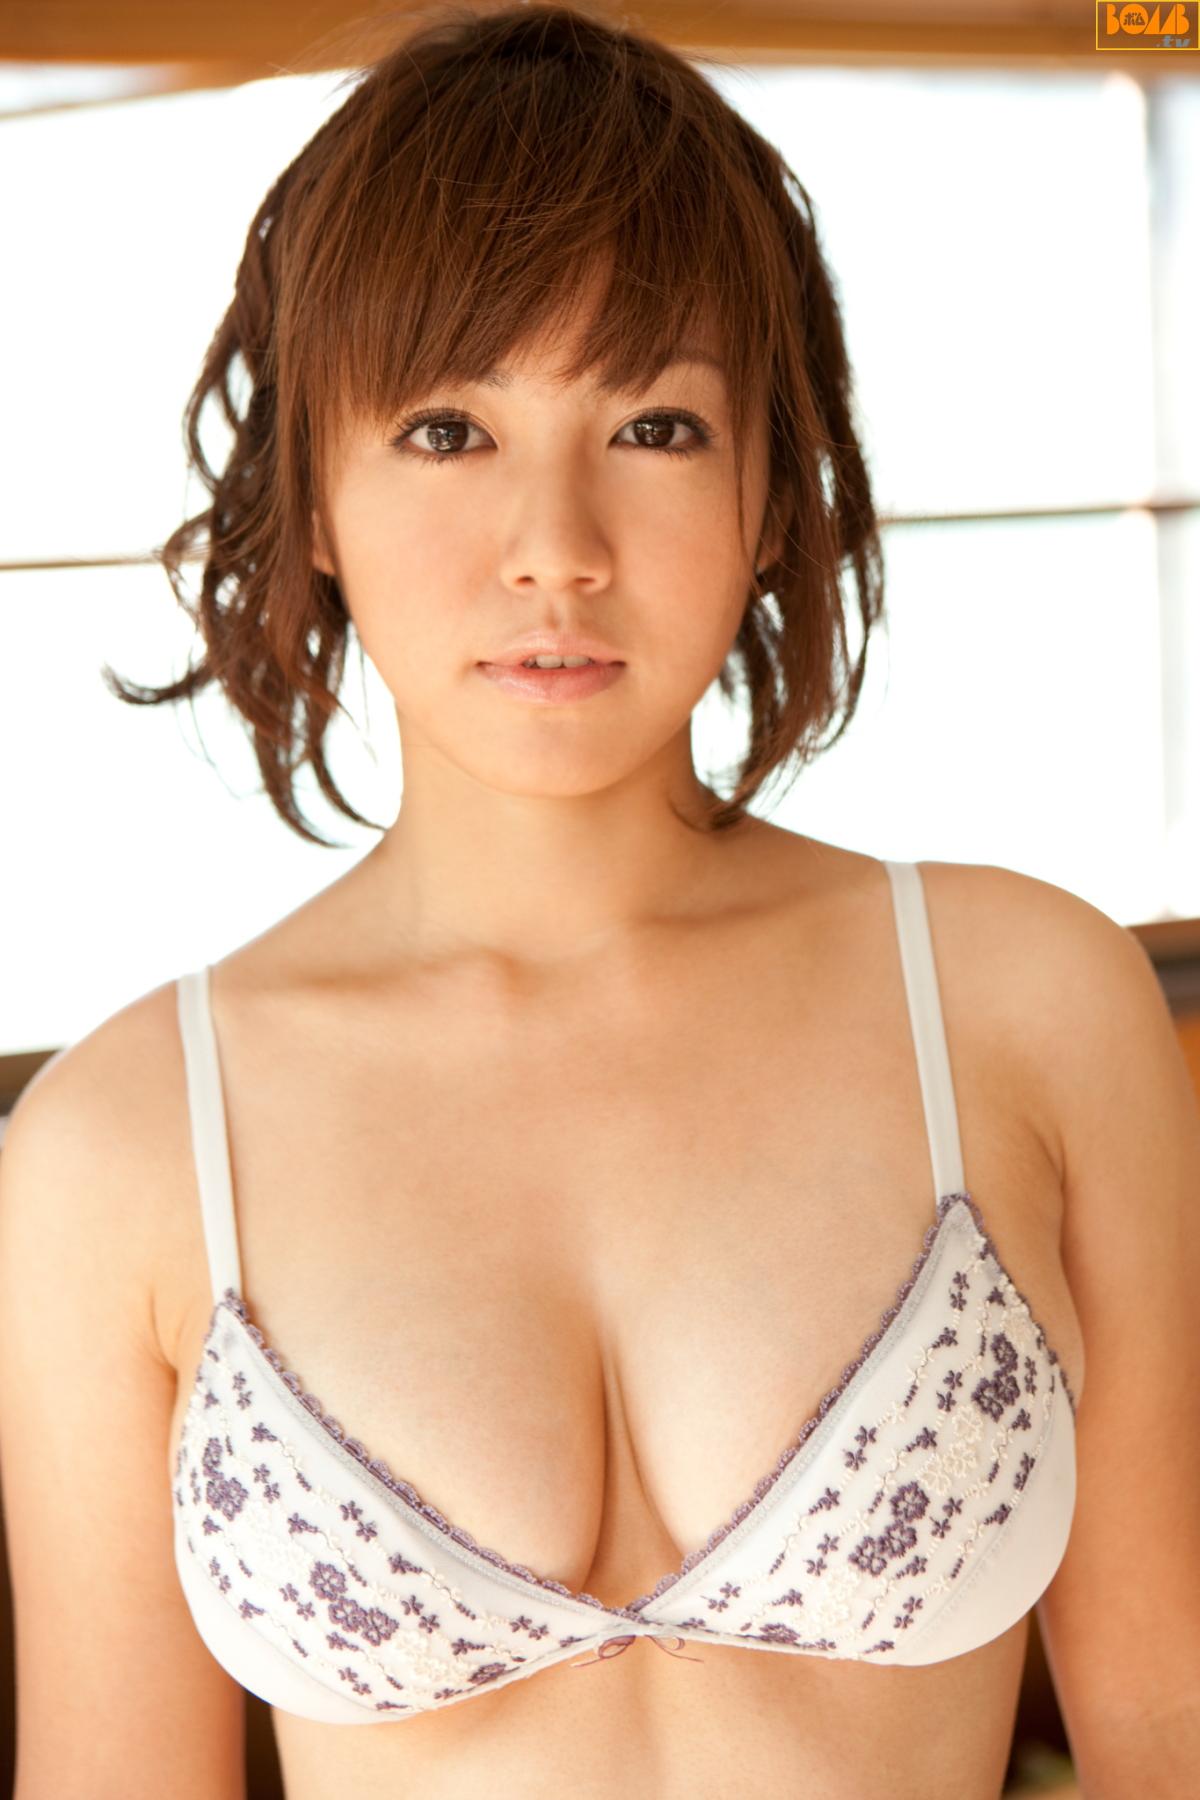 is015-jpg [Bomb.tv] 20110301 Sayaka Isoyama 磯山さやか No.1 追加! 09030